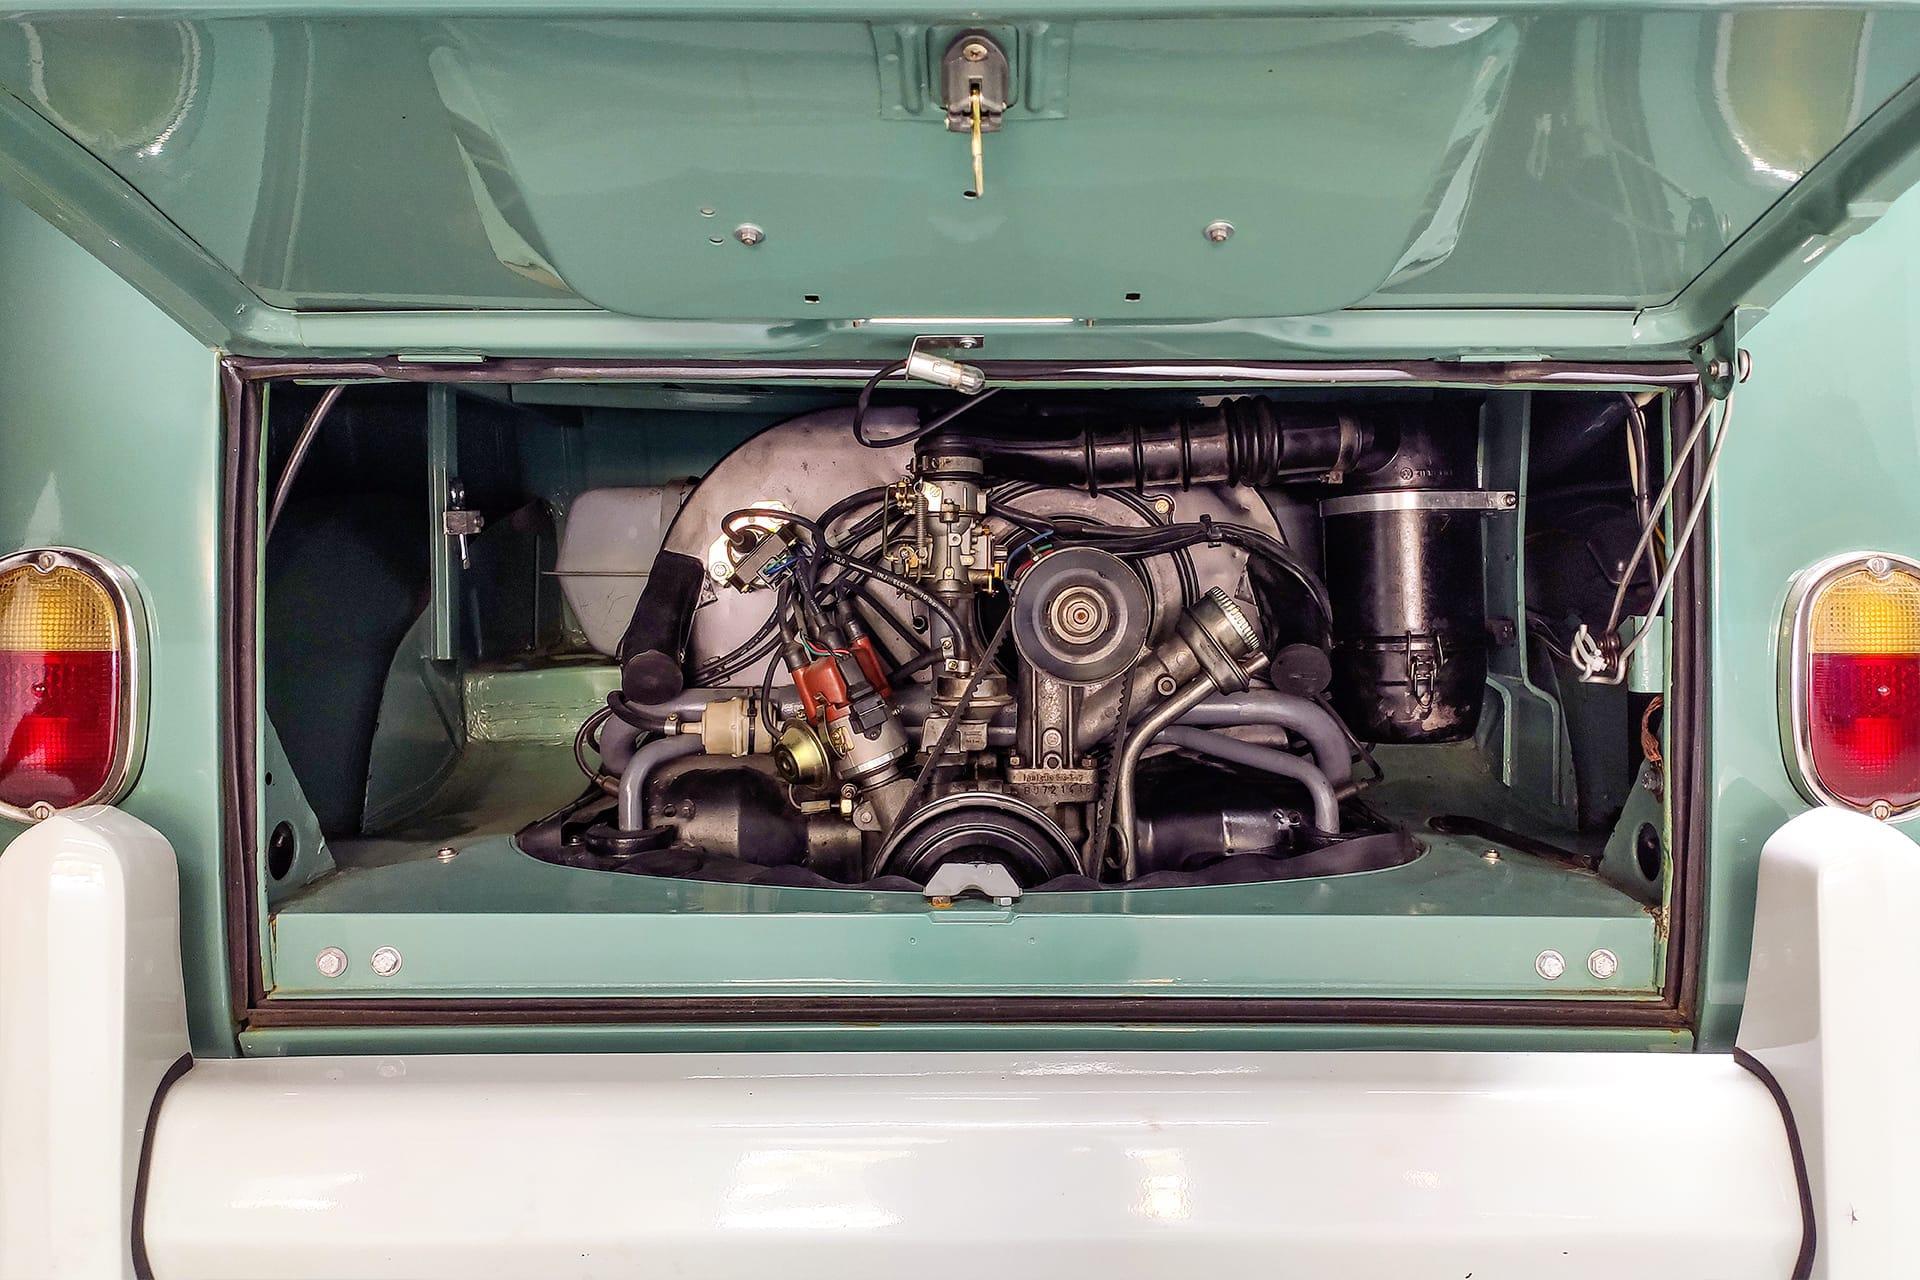 VW Bulli Luftgekühlt 4 Zylinder Boxermotor Oldtimer Käfer